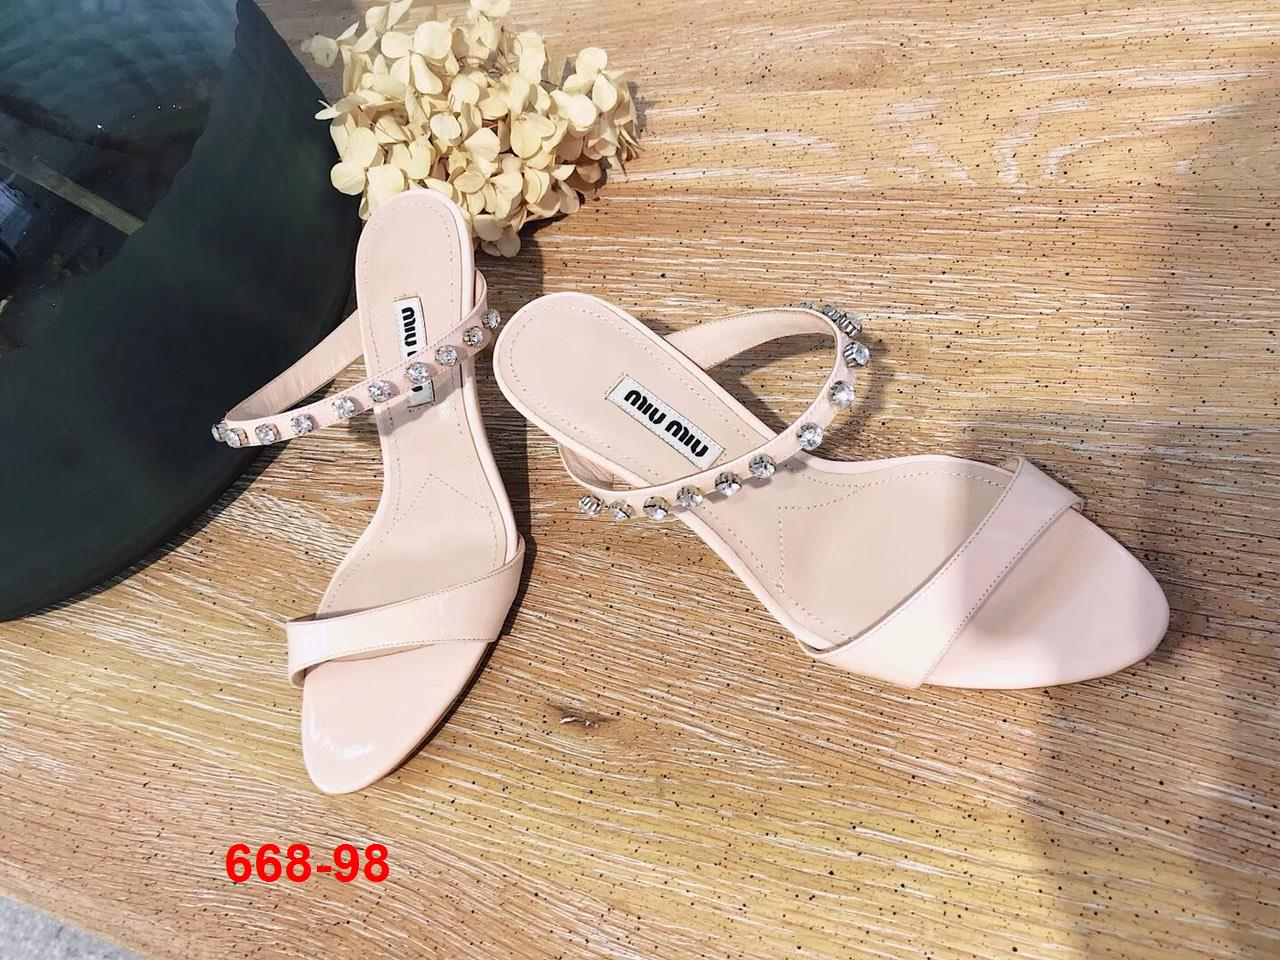 668-98 Miu Miu sandal cao 6cm siêu cấp